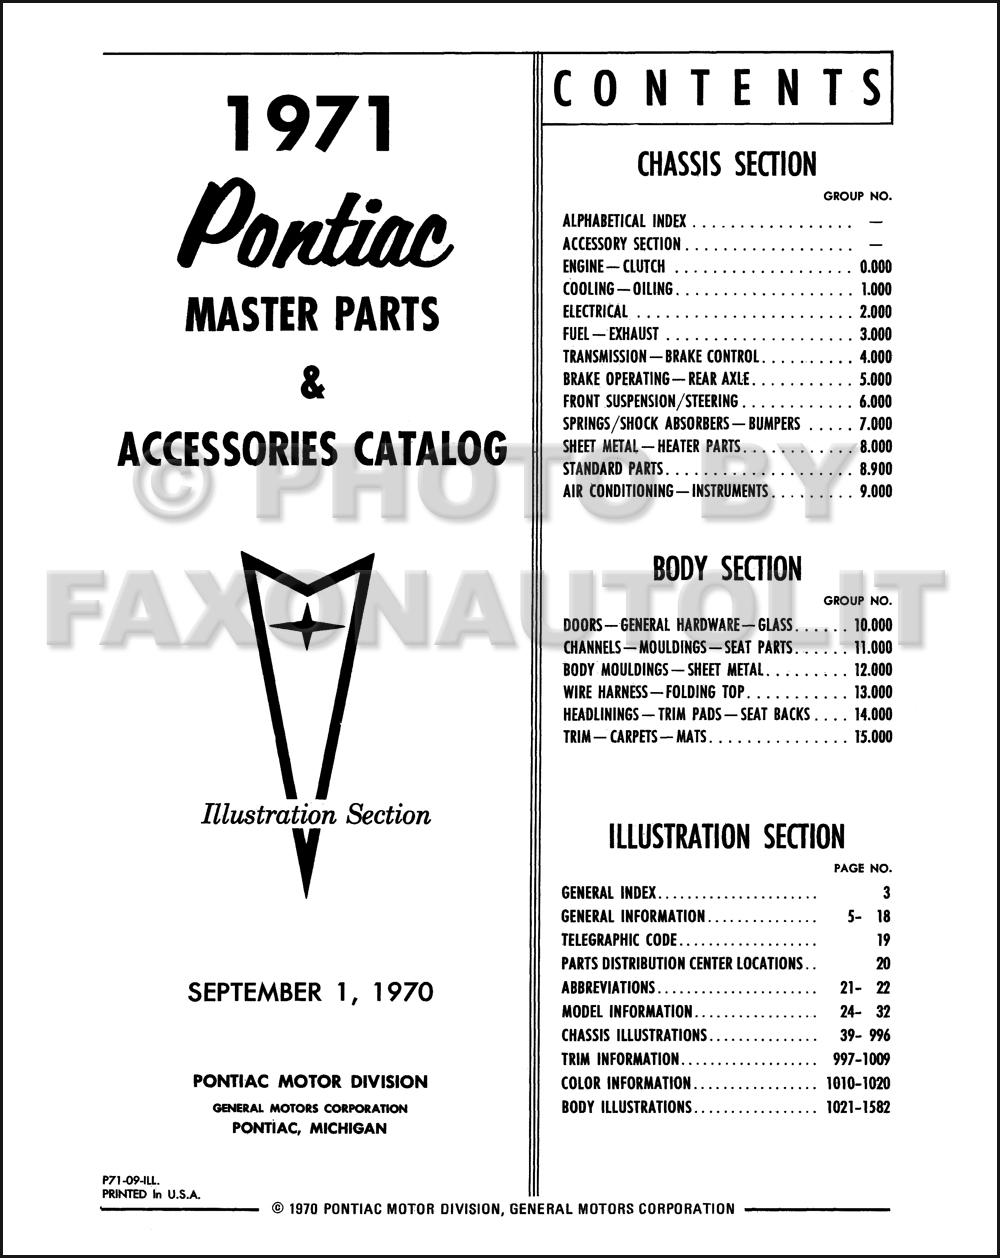 1964 1971 Pontiac Mechanical Parts Book Reprint Set Grand Prix Wiring Harness